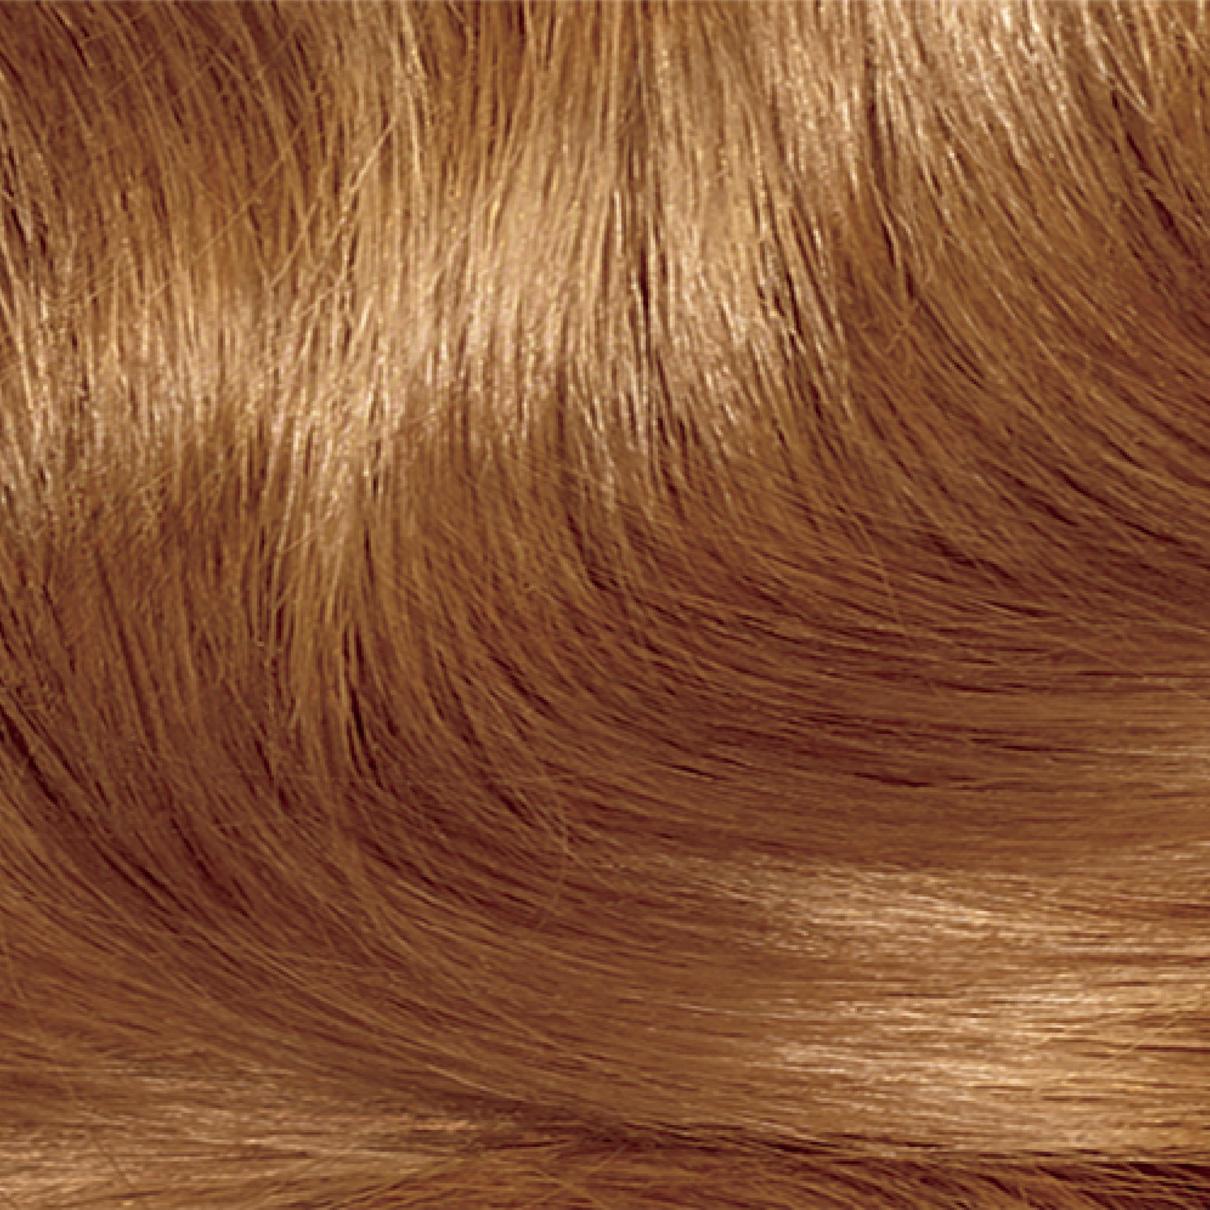 Permanent hair color clairol nice n easy lighter golden brown 8r medium reddish blonde nvjuhfo Gallery